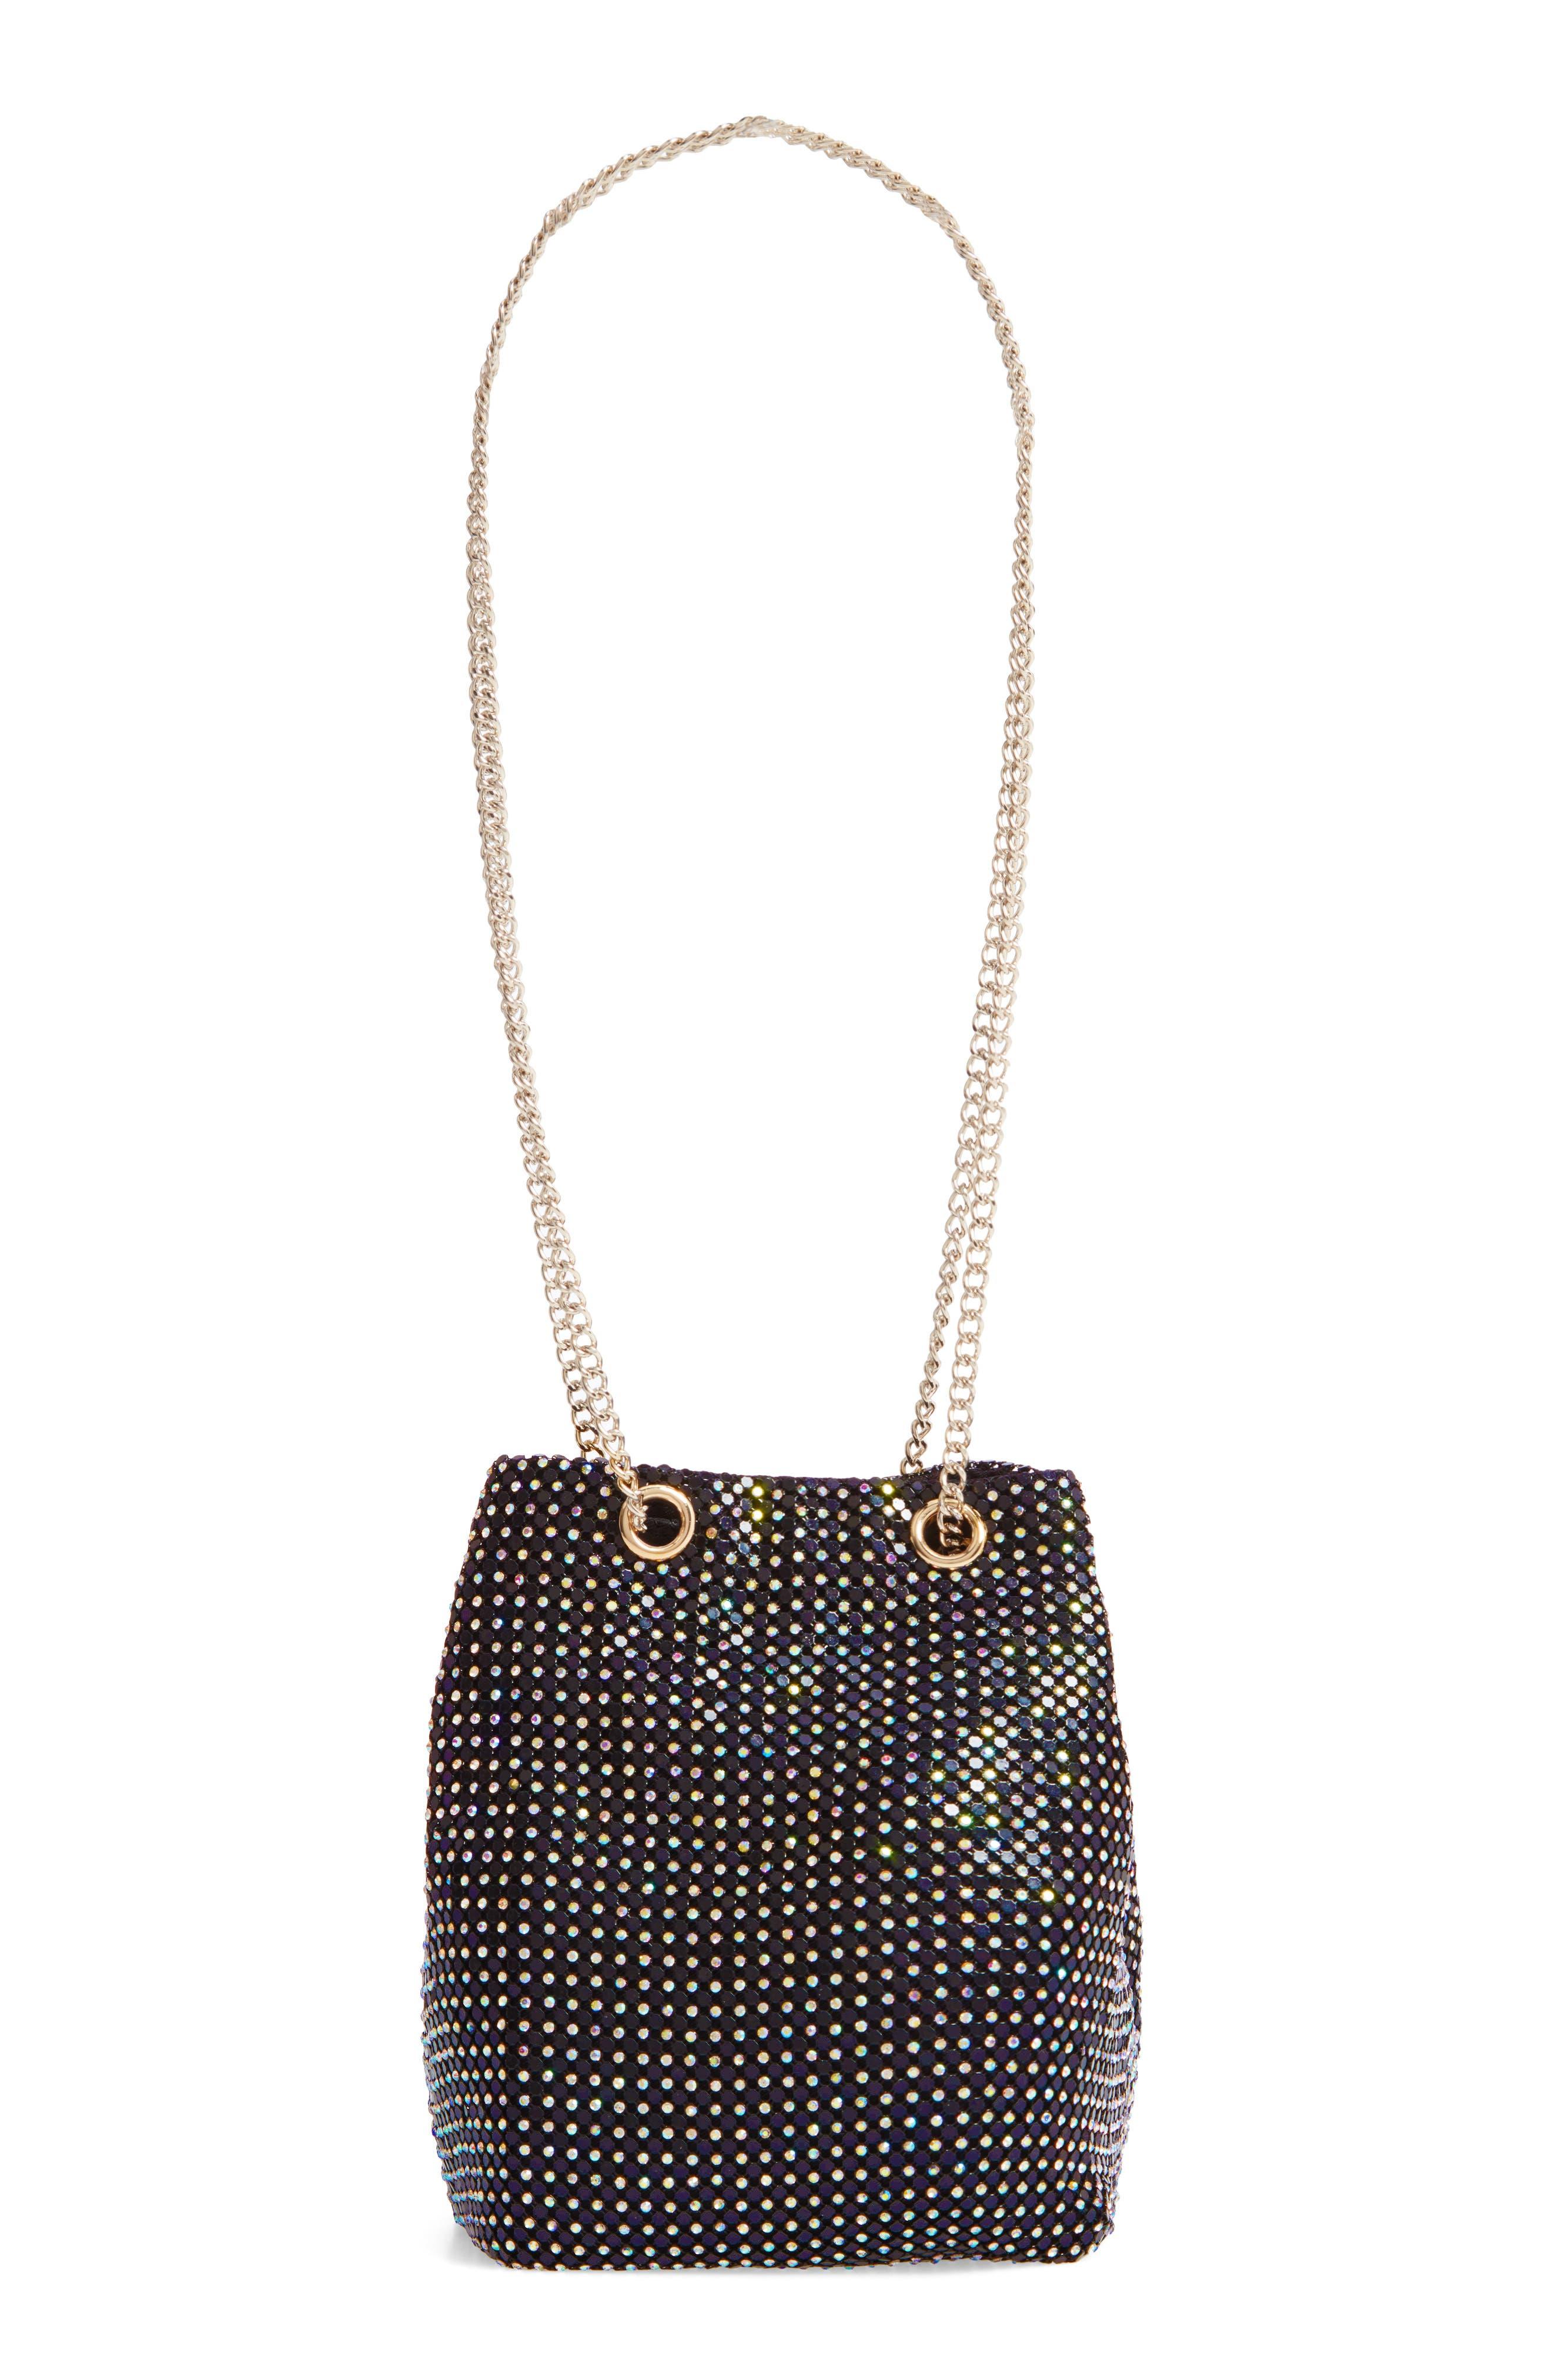 52e9c535ed7a Women s Bags Sale